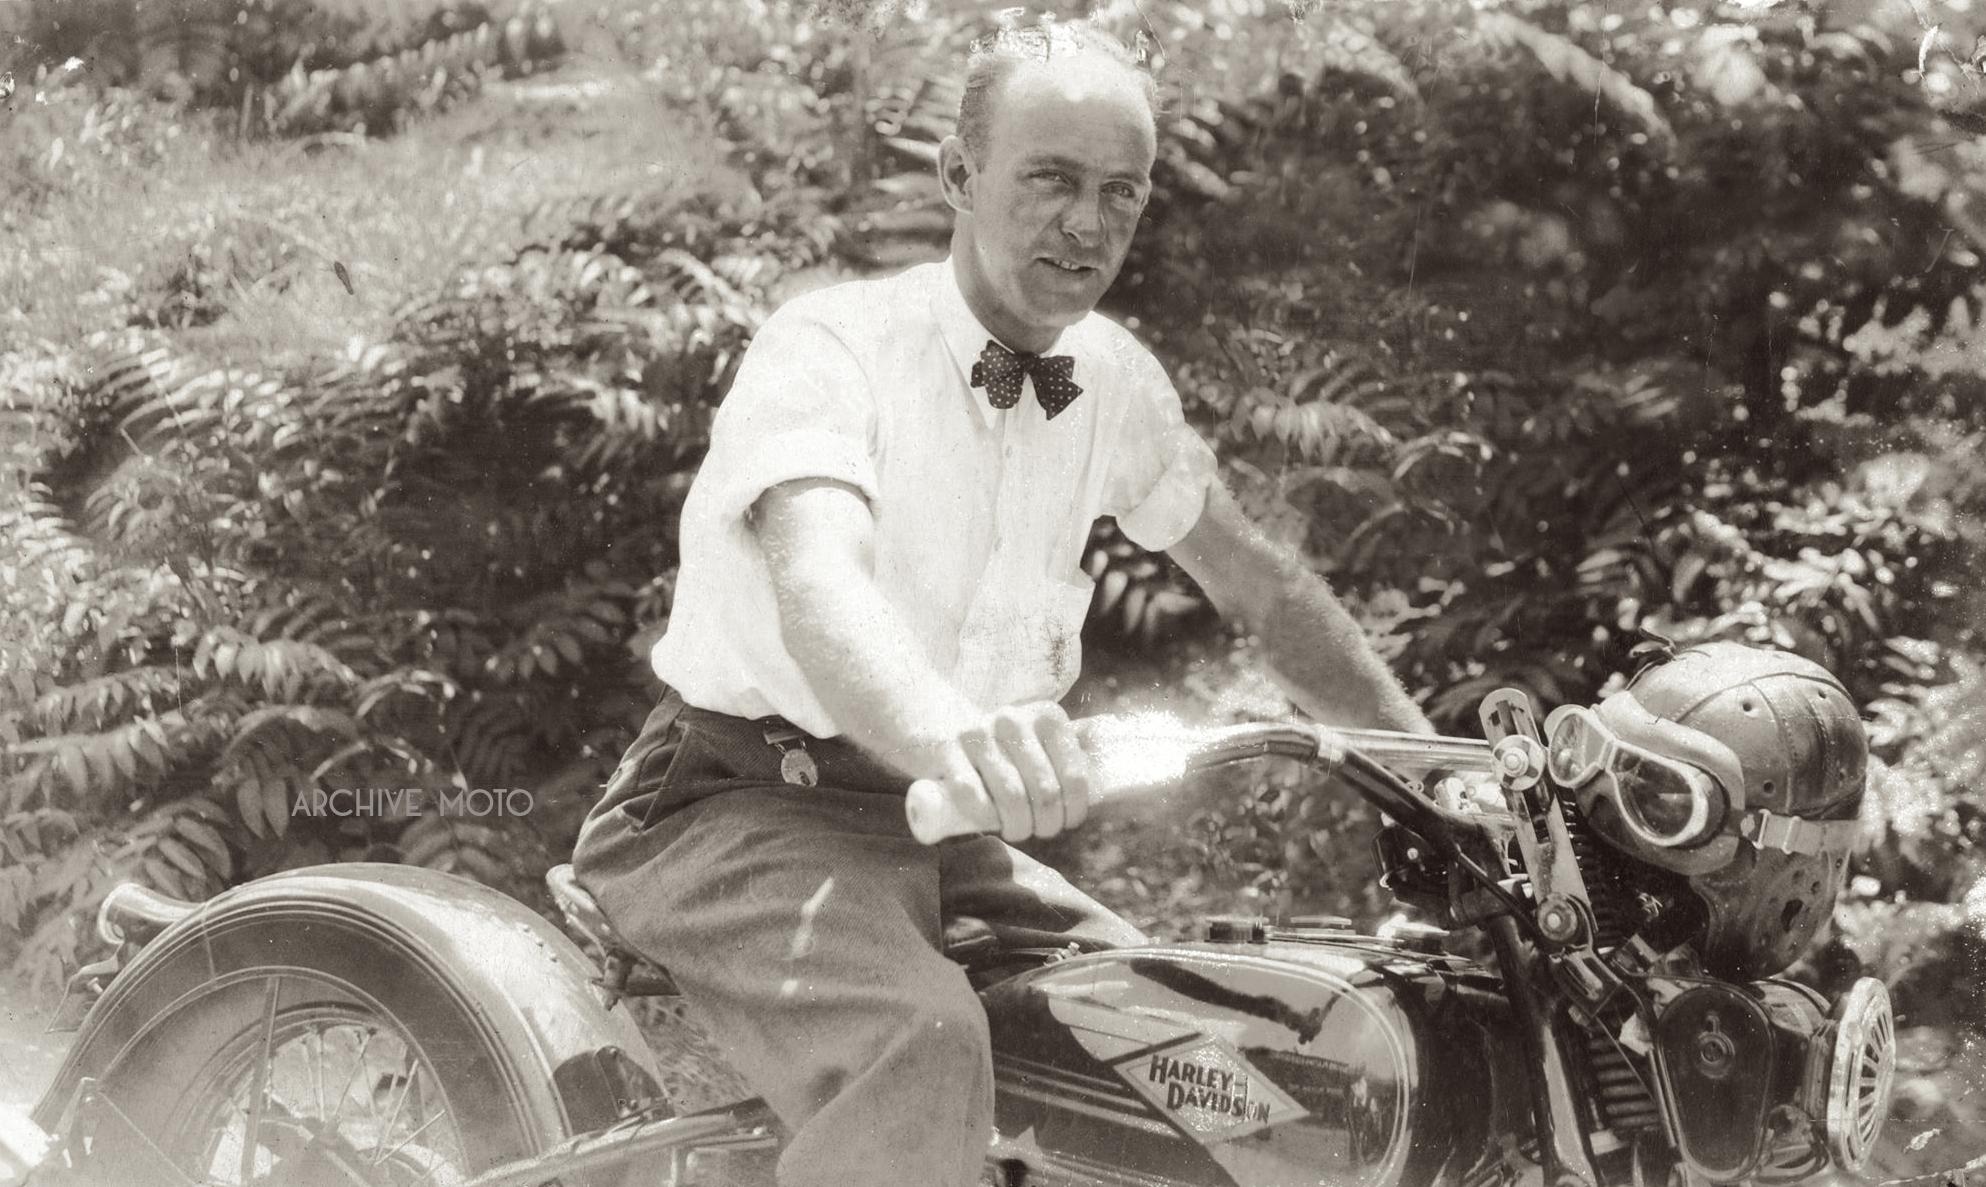 Bert Baisden, winner of the 1933 Savannah 200 Mile Championship Road Race, onboard his Harley-Davidson RL ca. 1934.